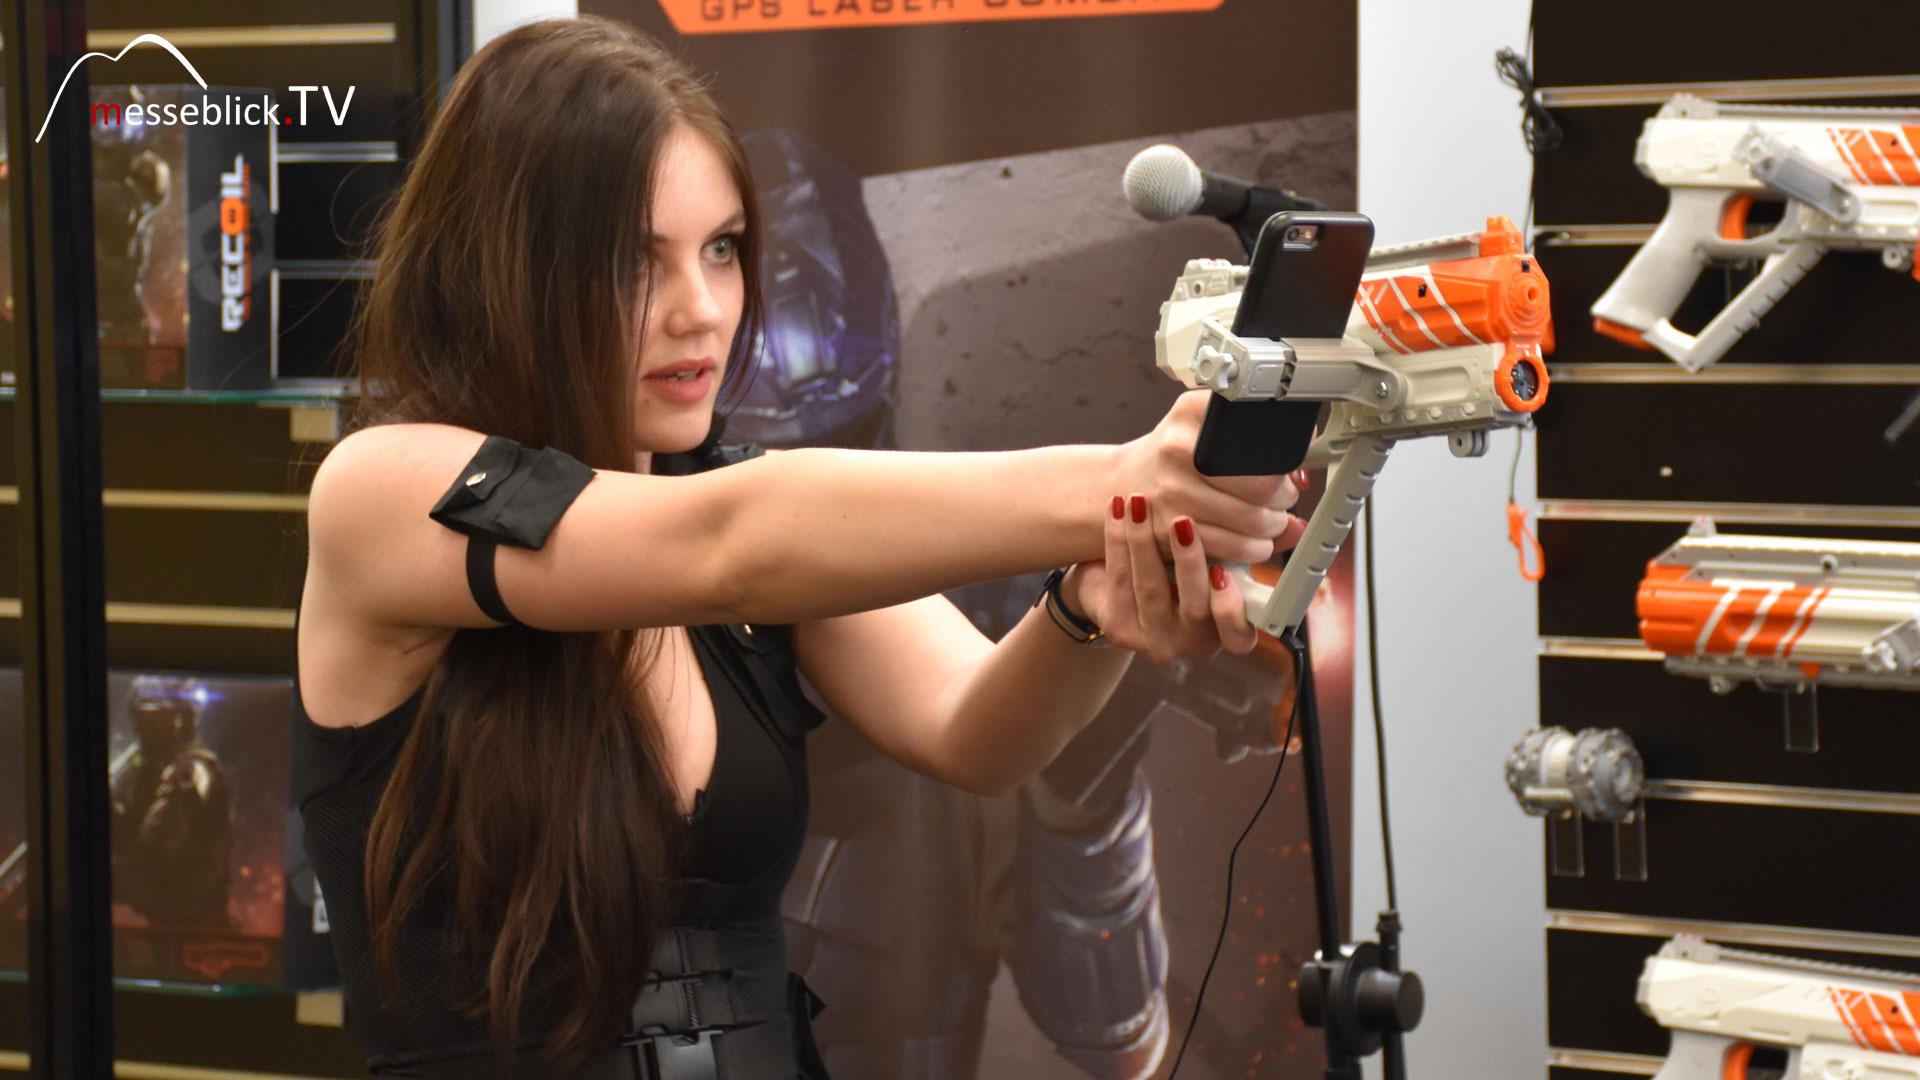 Recoil GPS Laser Combat Goliath